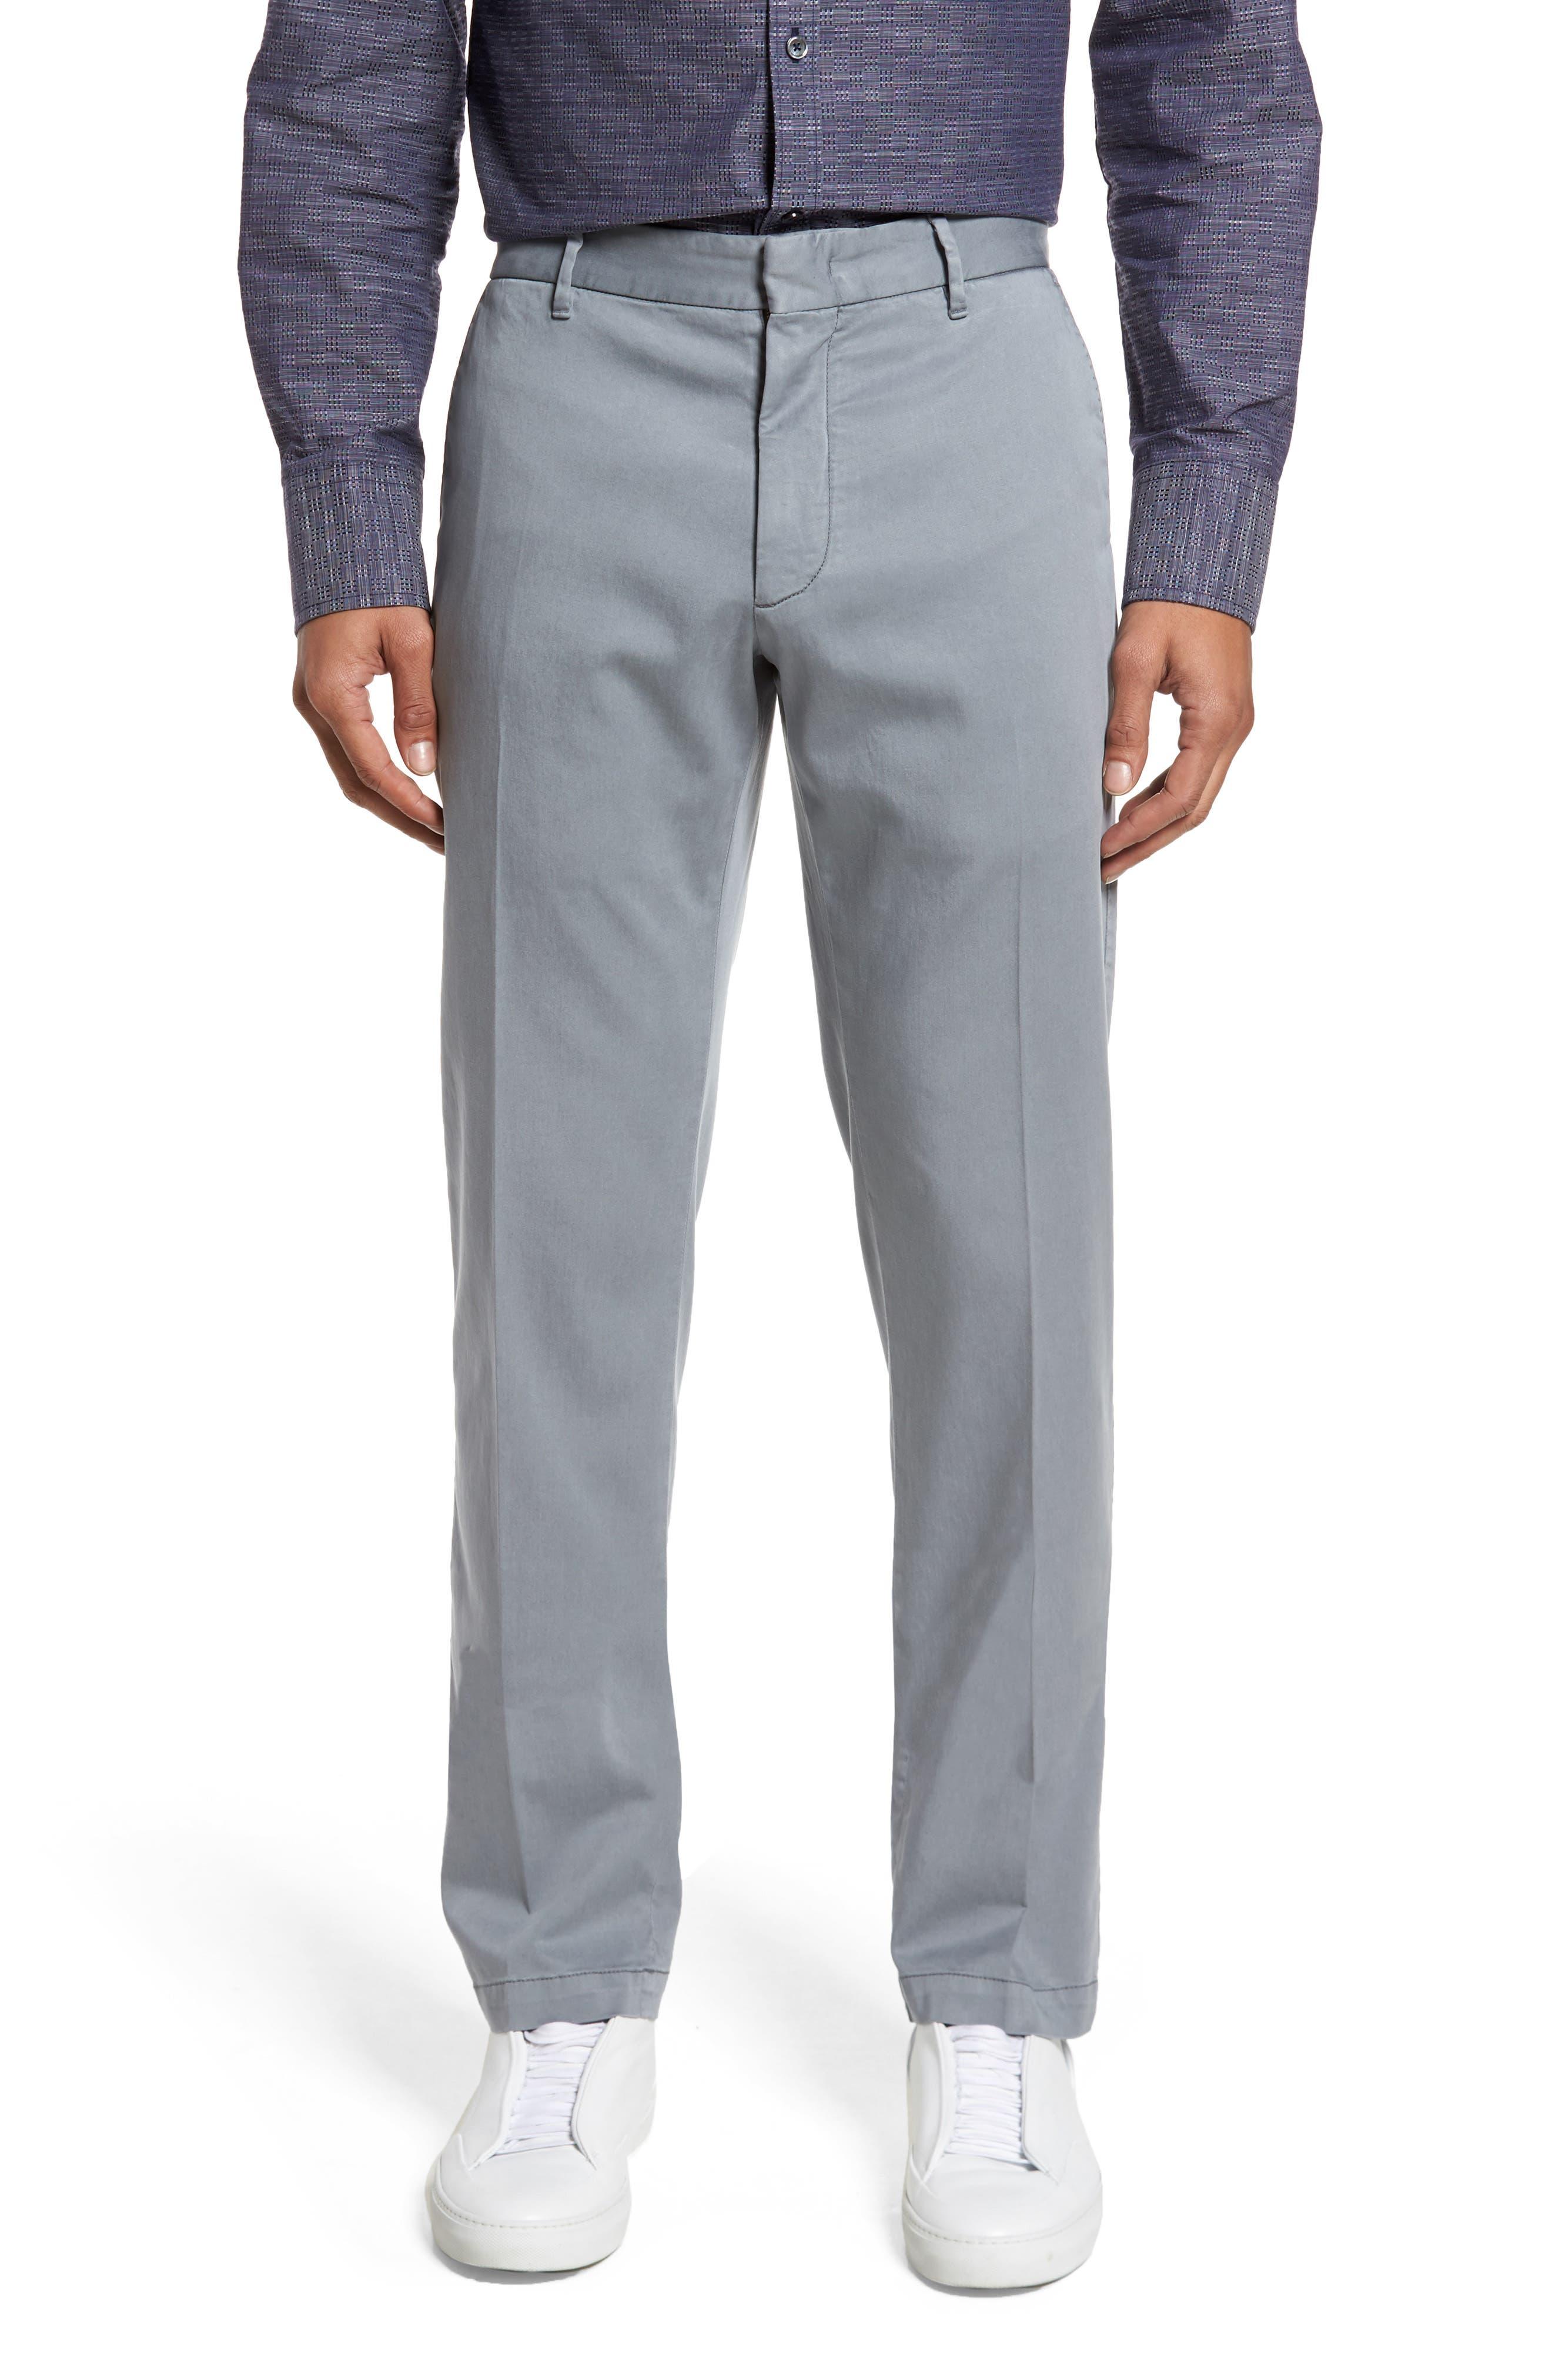 Aster Straight Fit Pants,                             Main thumbnail 1, color,                             020